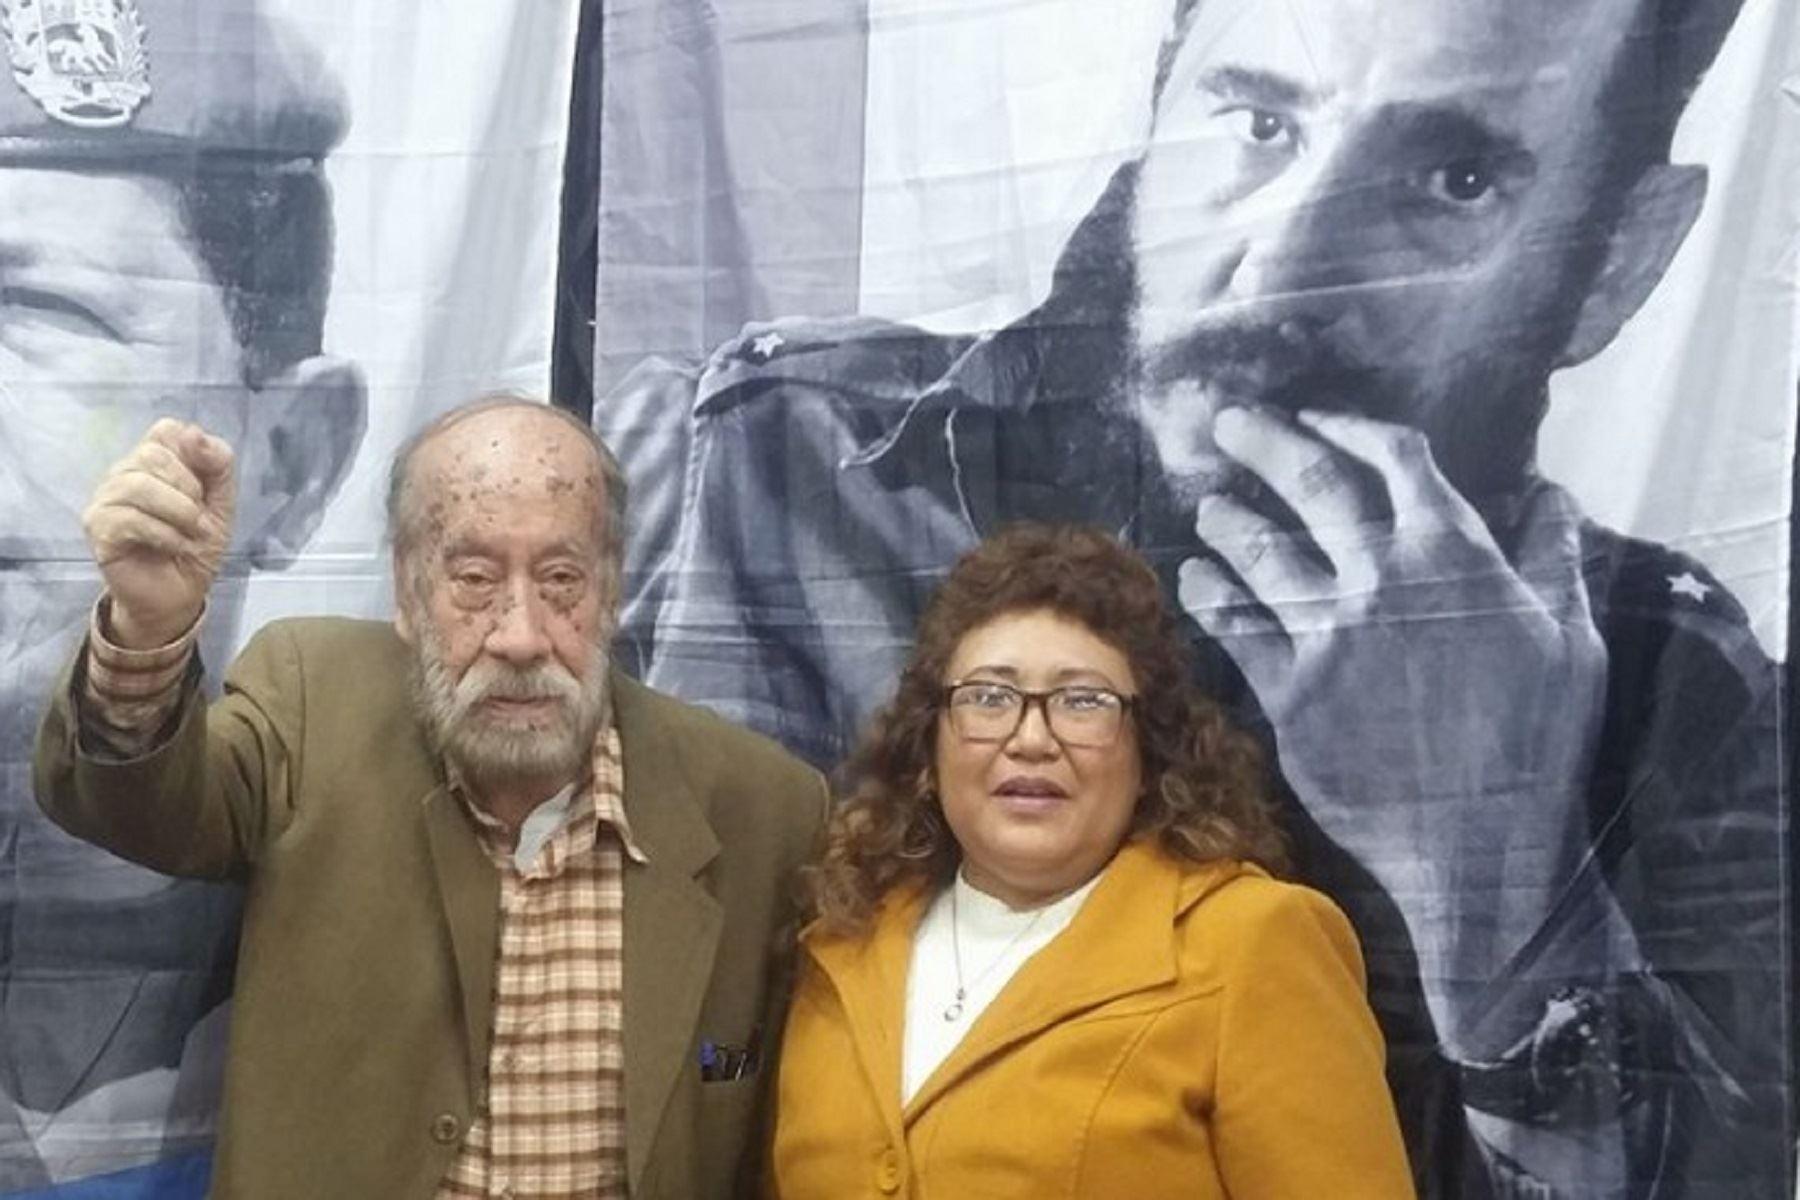 Falleció Genaro Ledesma, histórico líder de la izquierda peruana